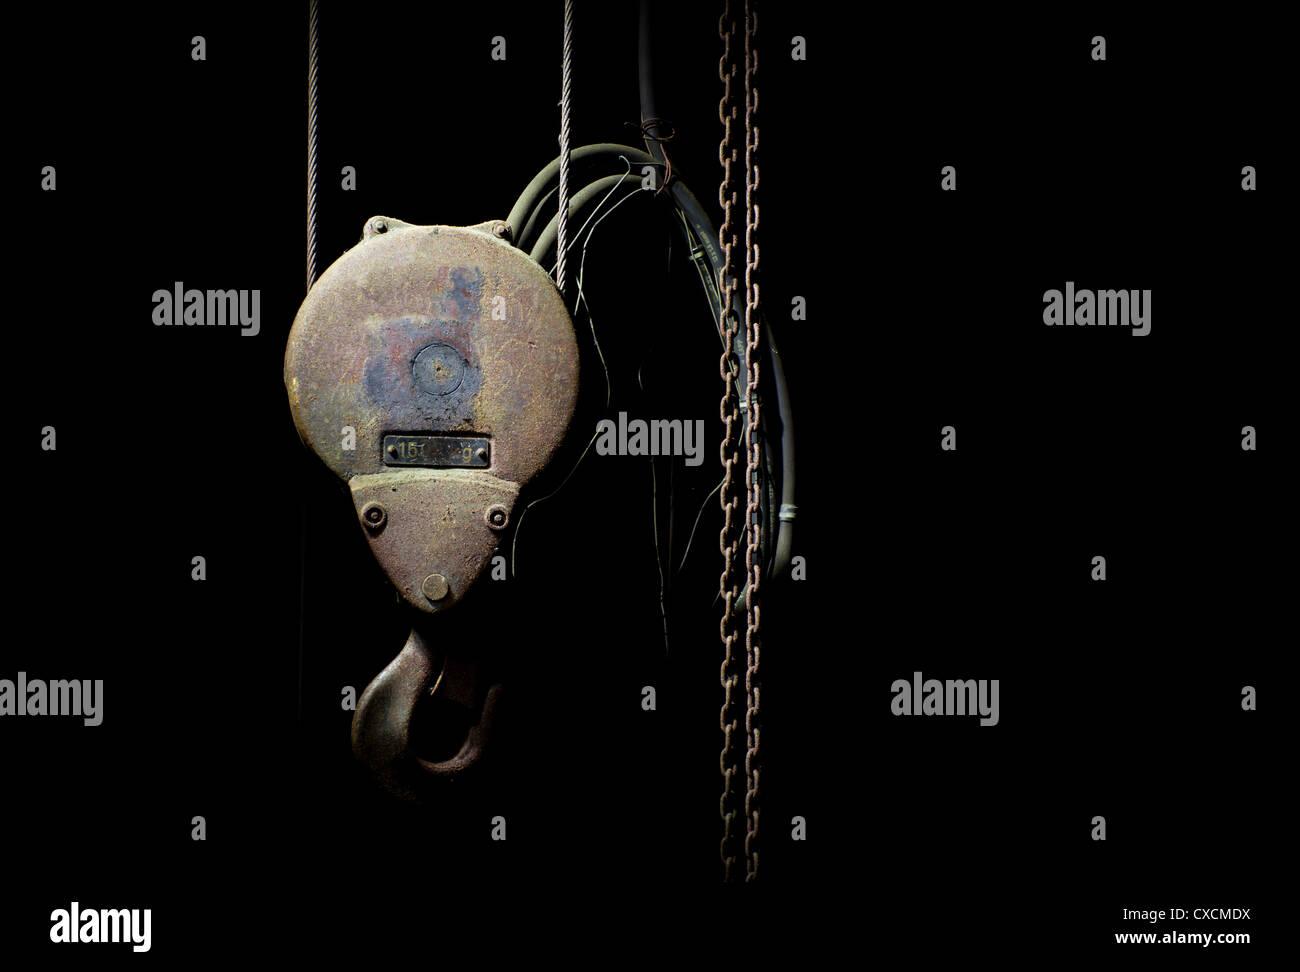 Rusty hoist - Stock Image